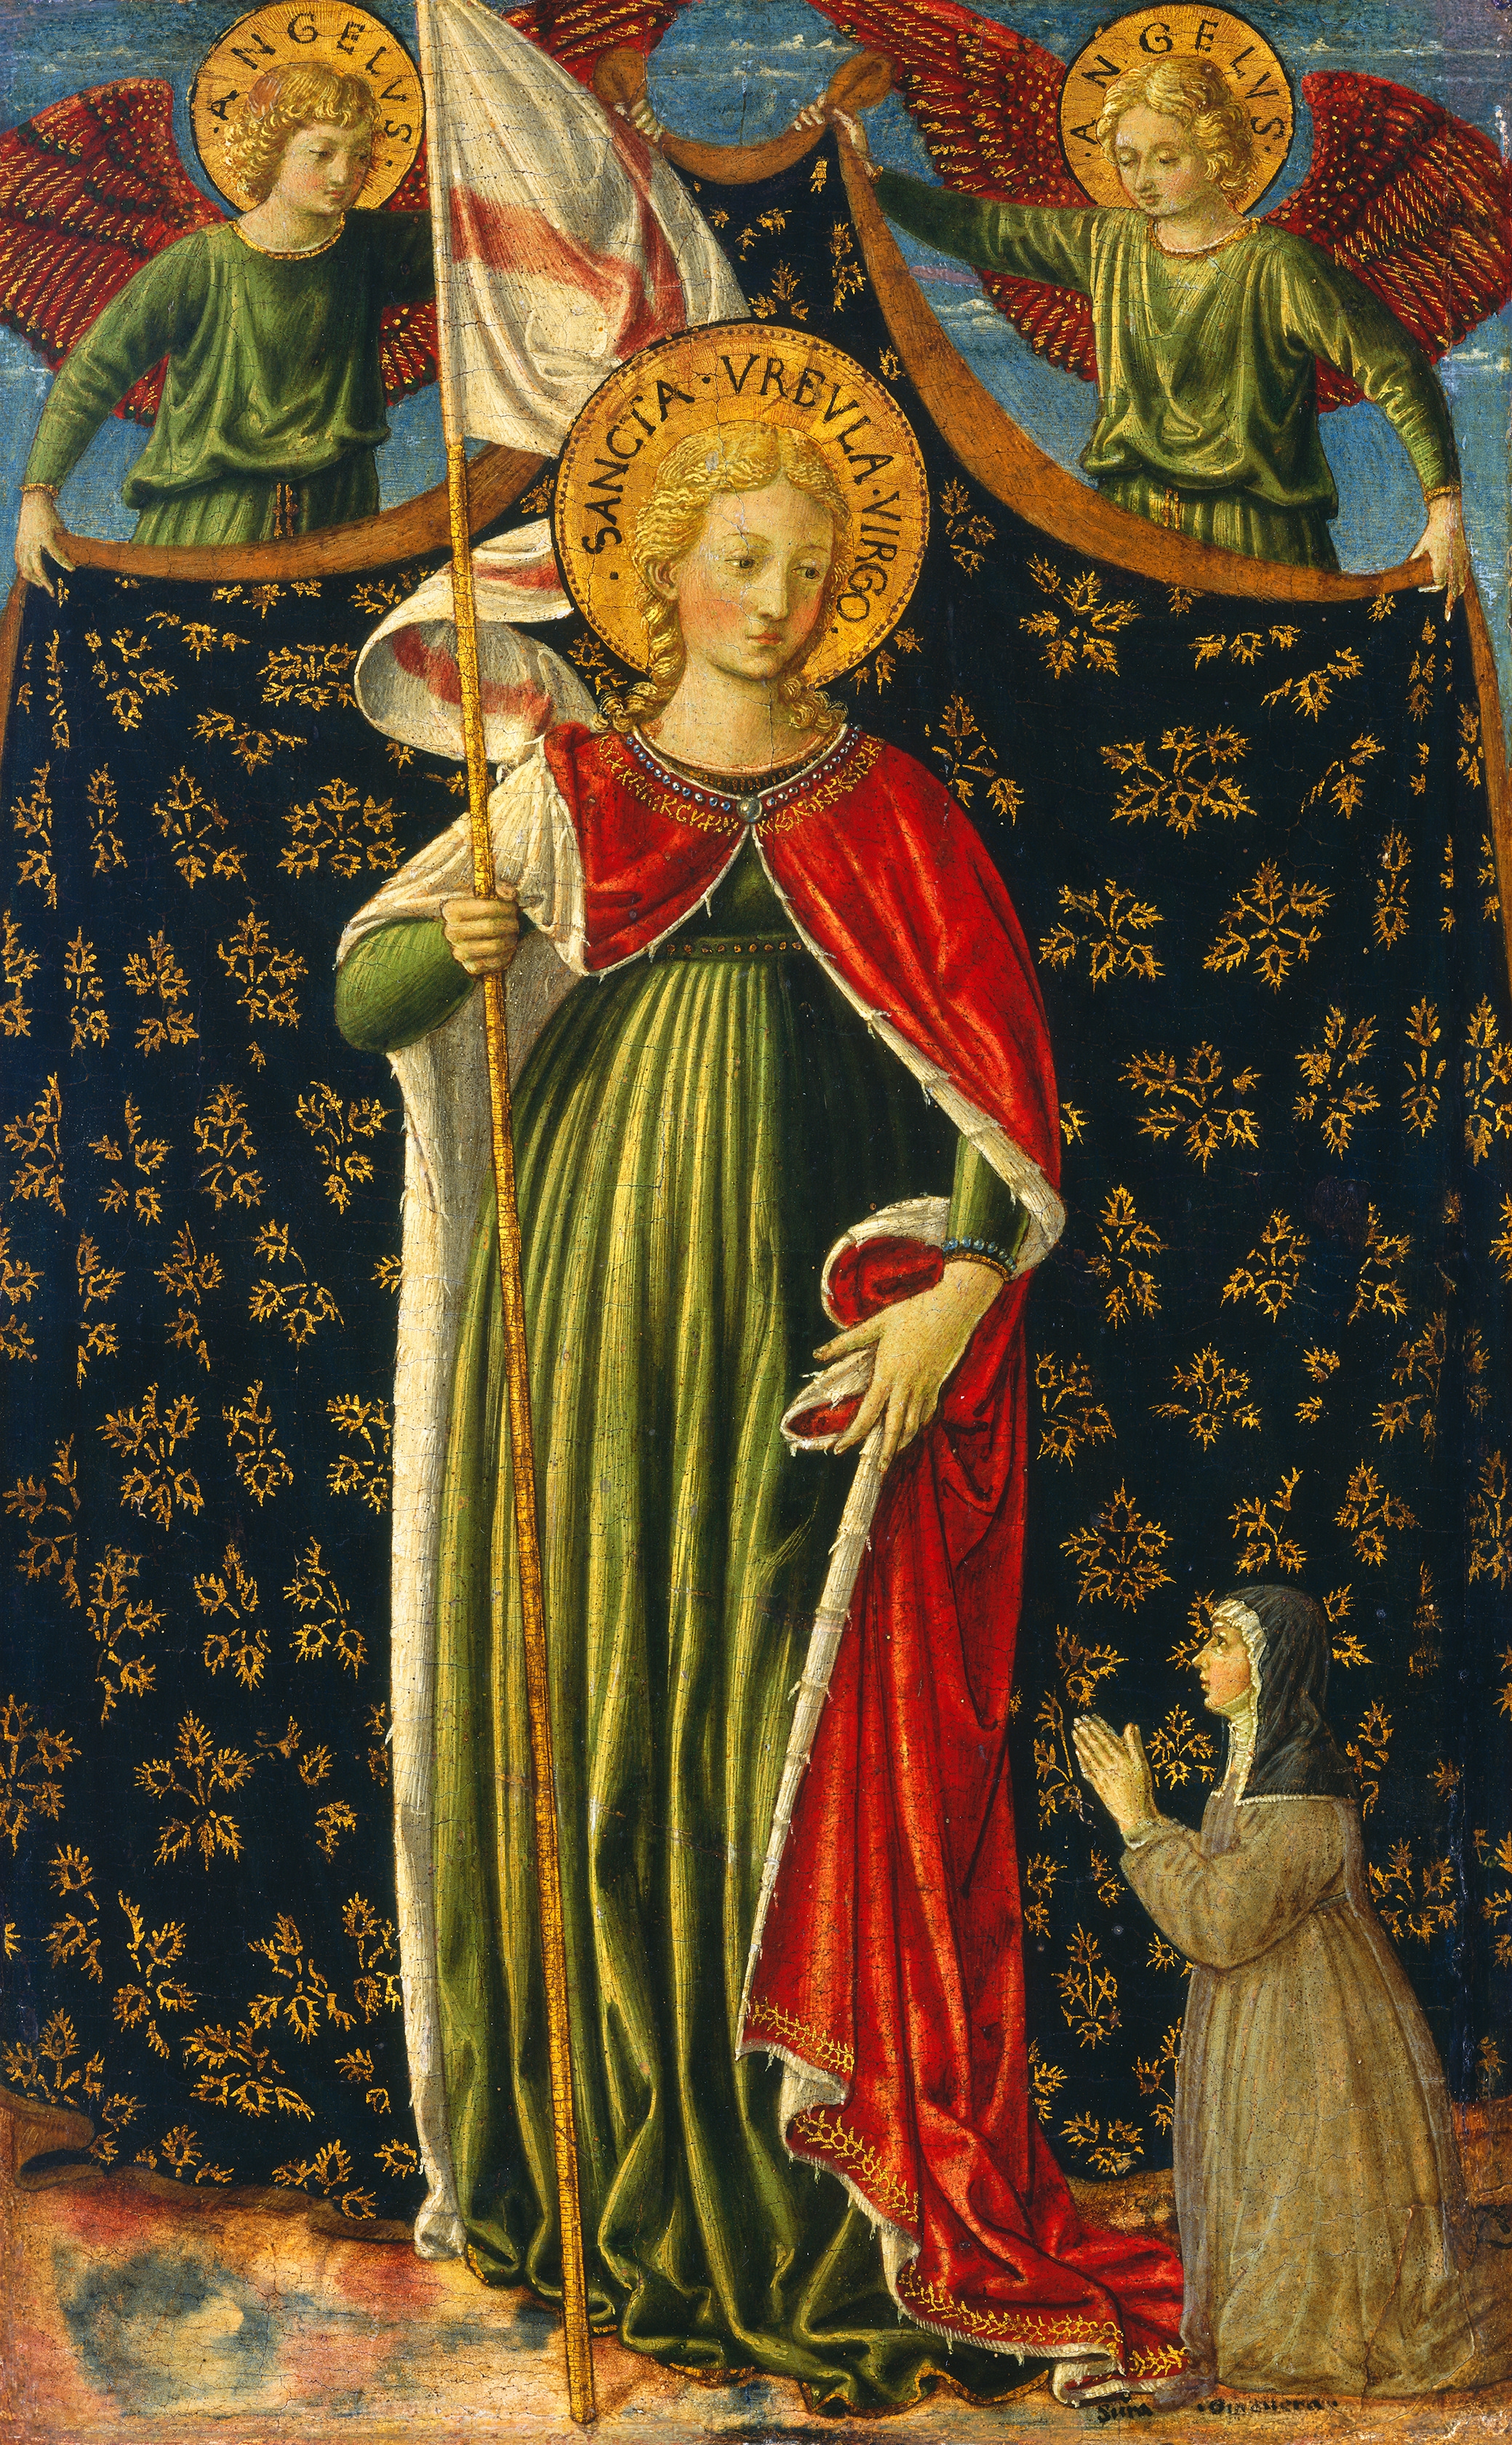 Saint Ursula, painted byBenozzo Gozzoli, c. 1455 60.